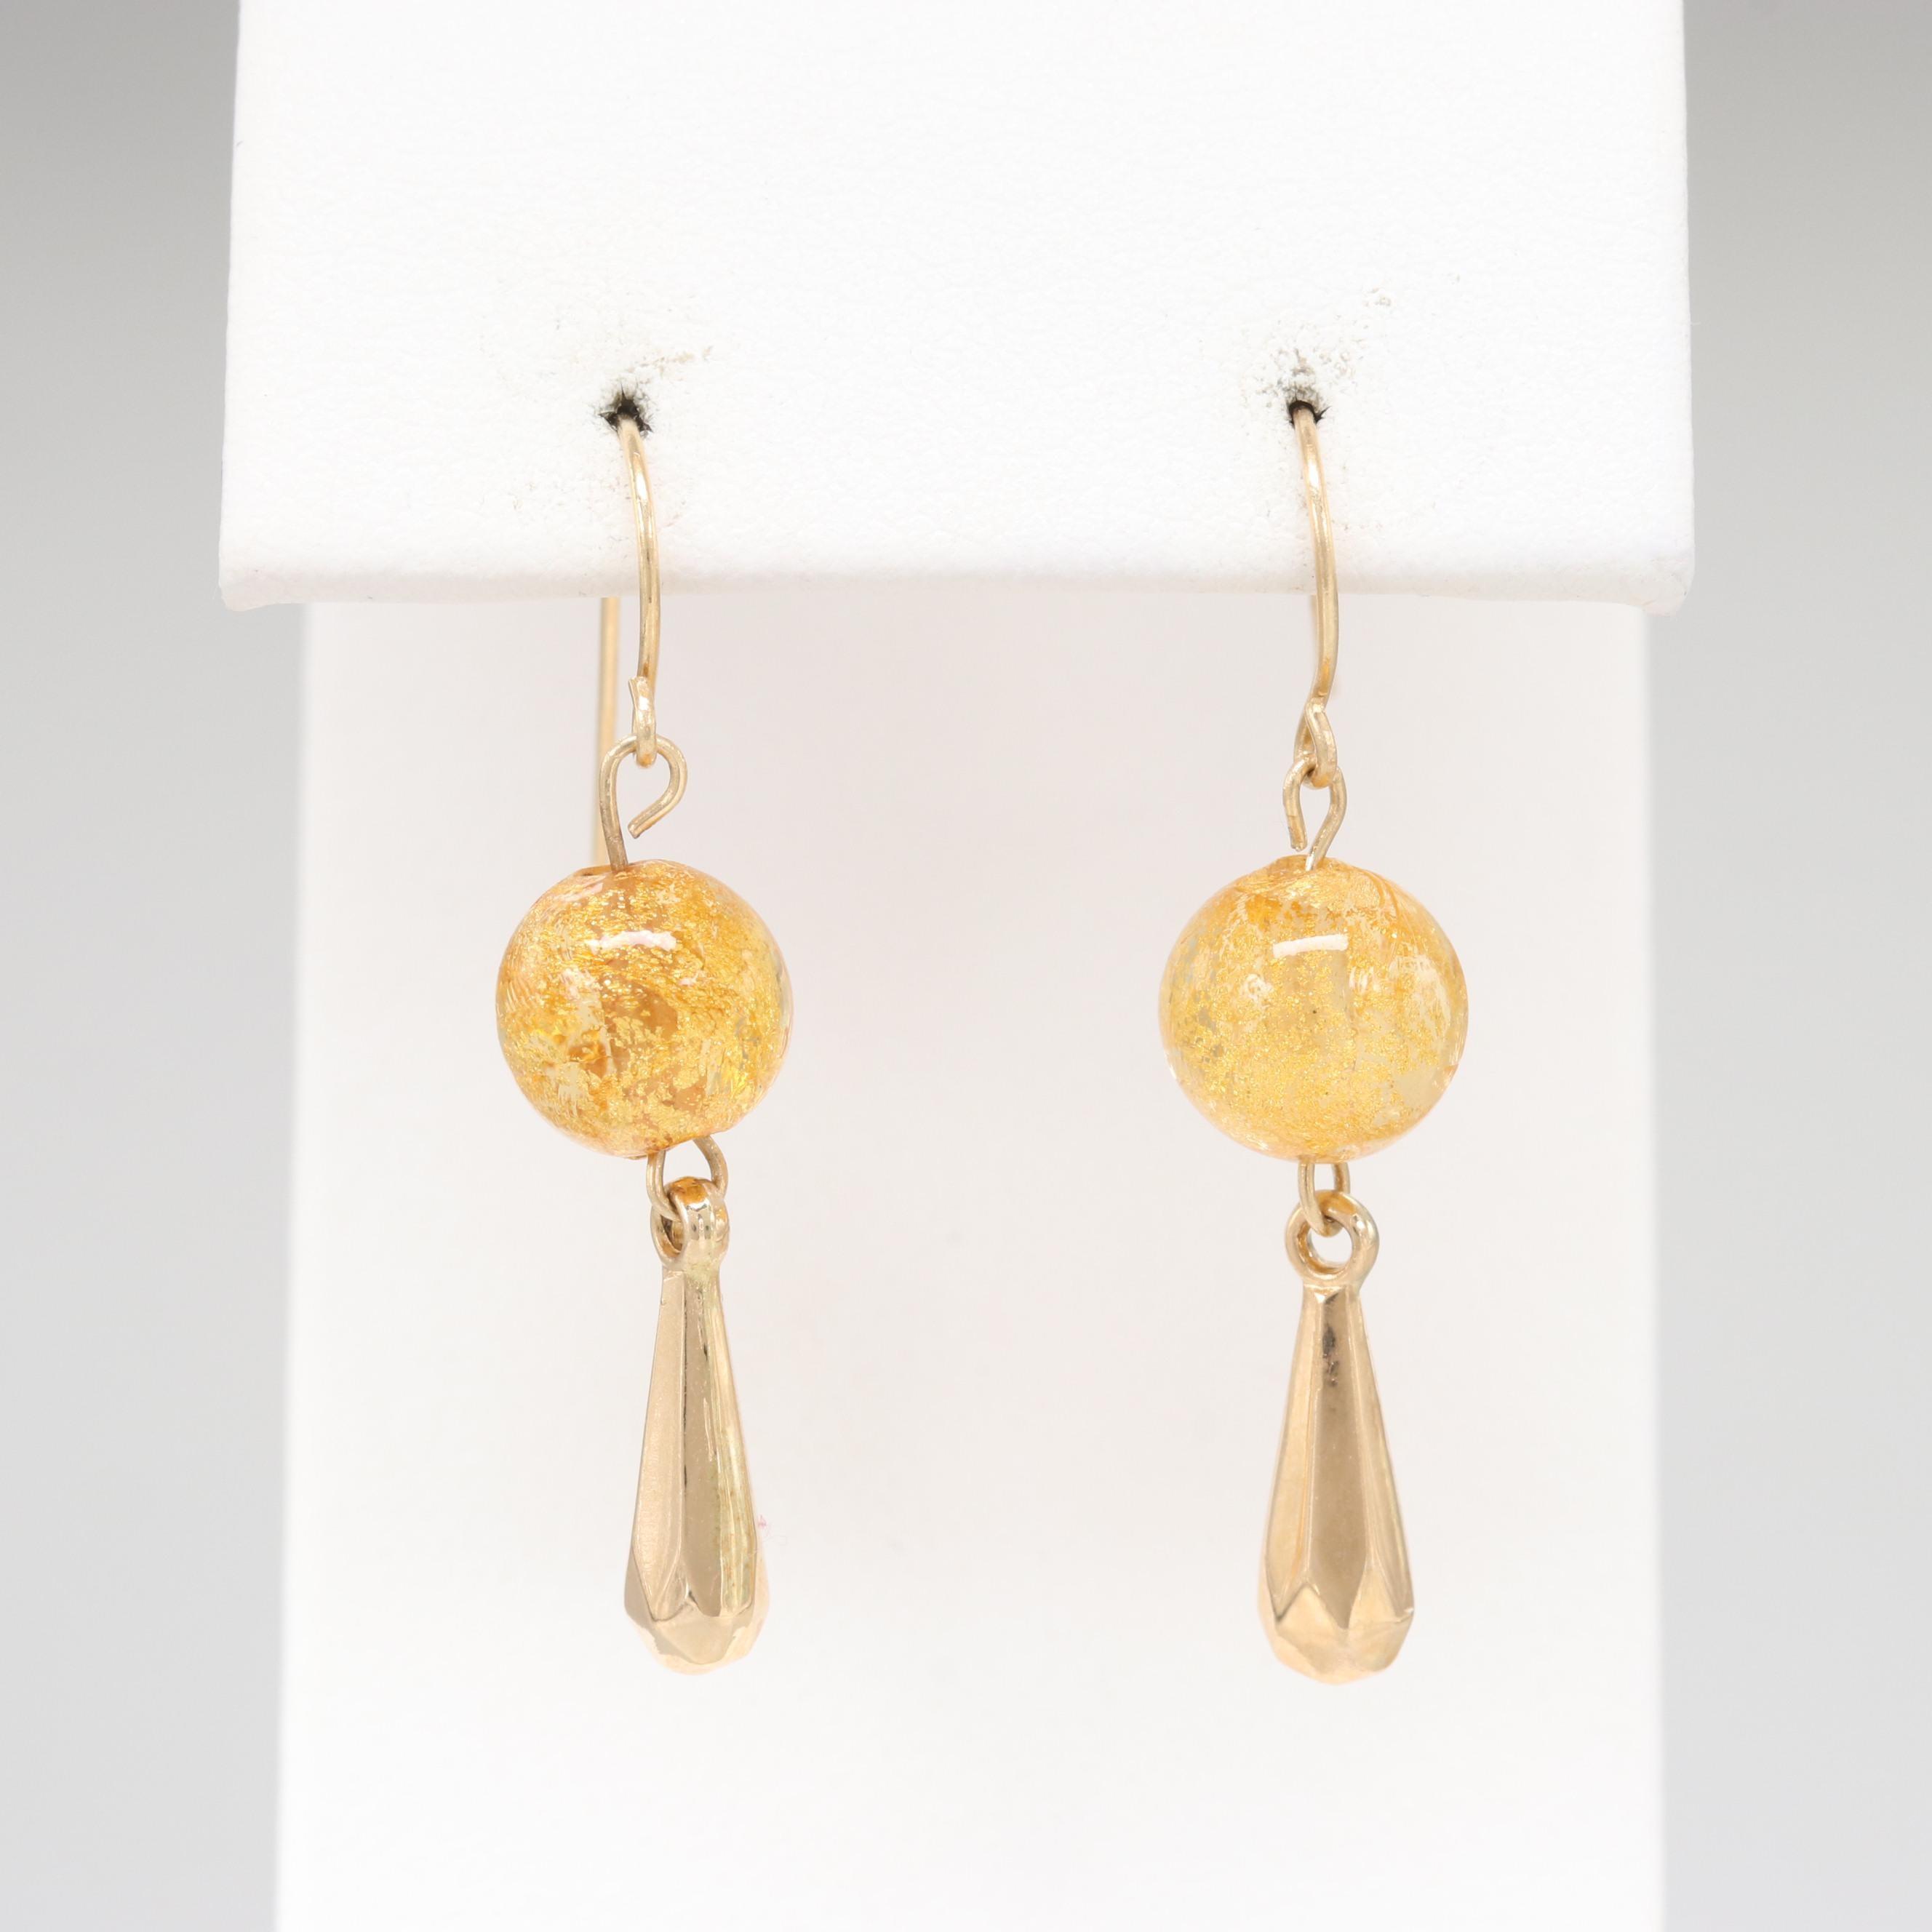 14K Yellow Gold Glass Dangle Earrings